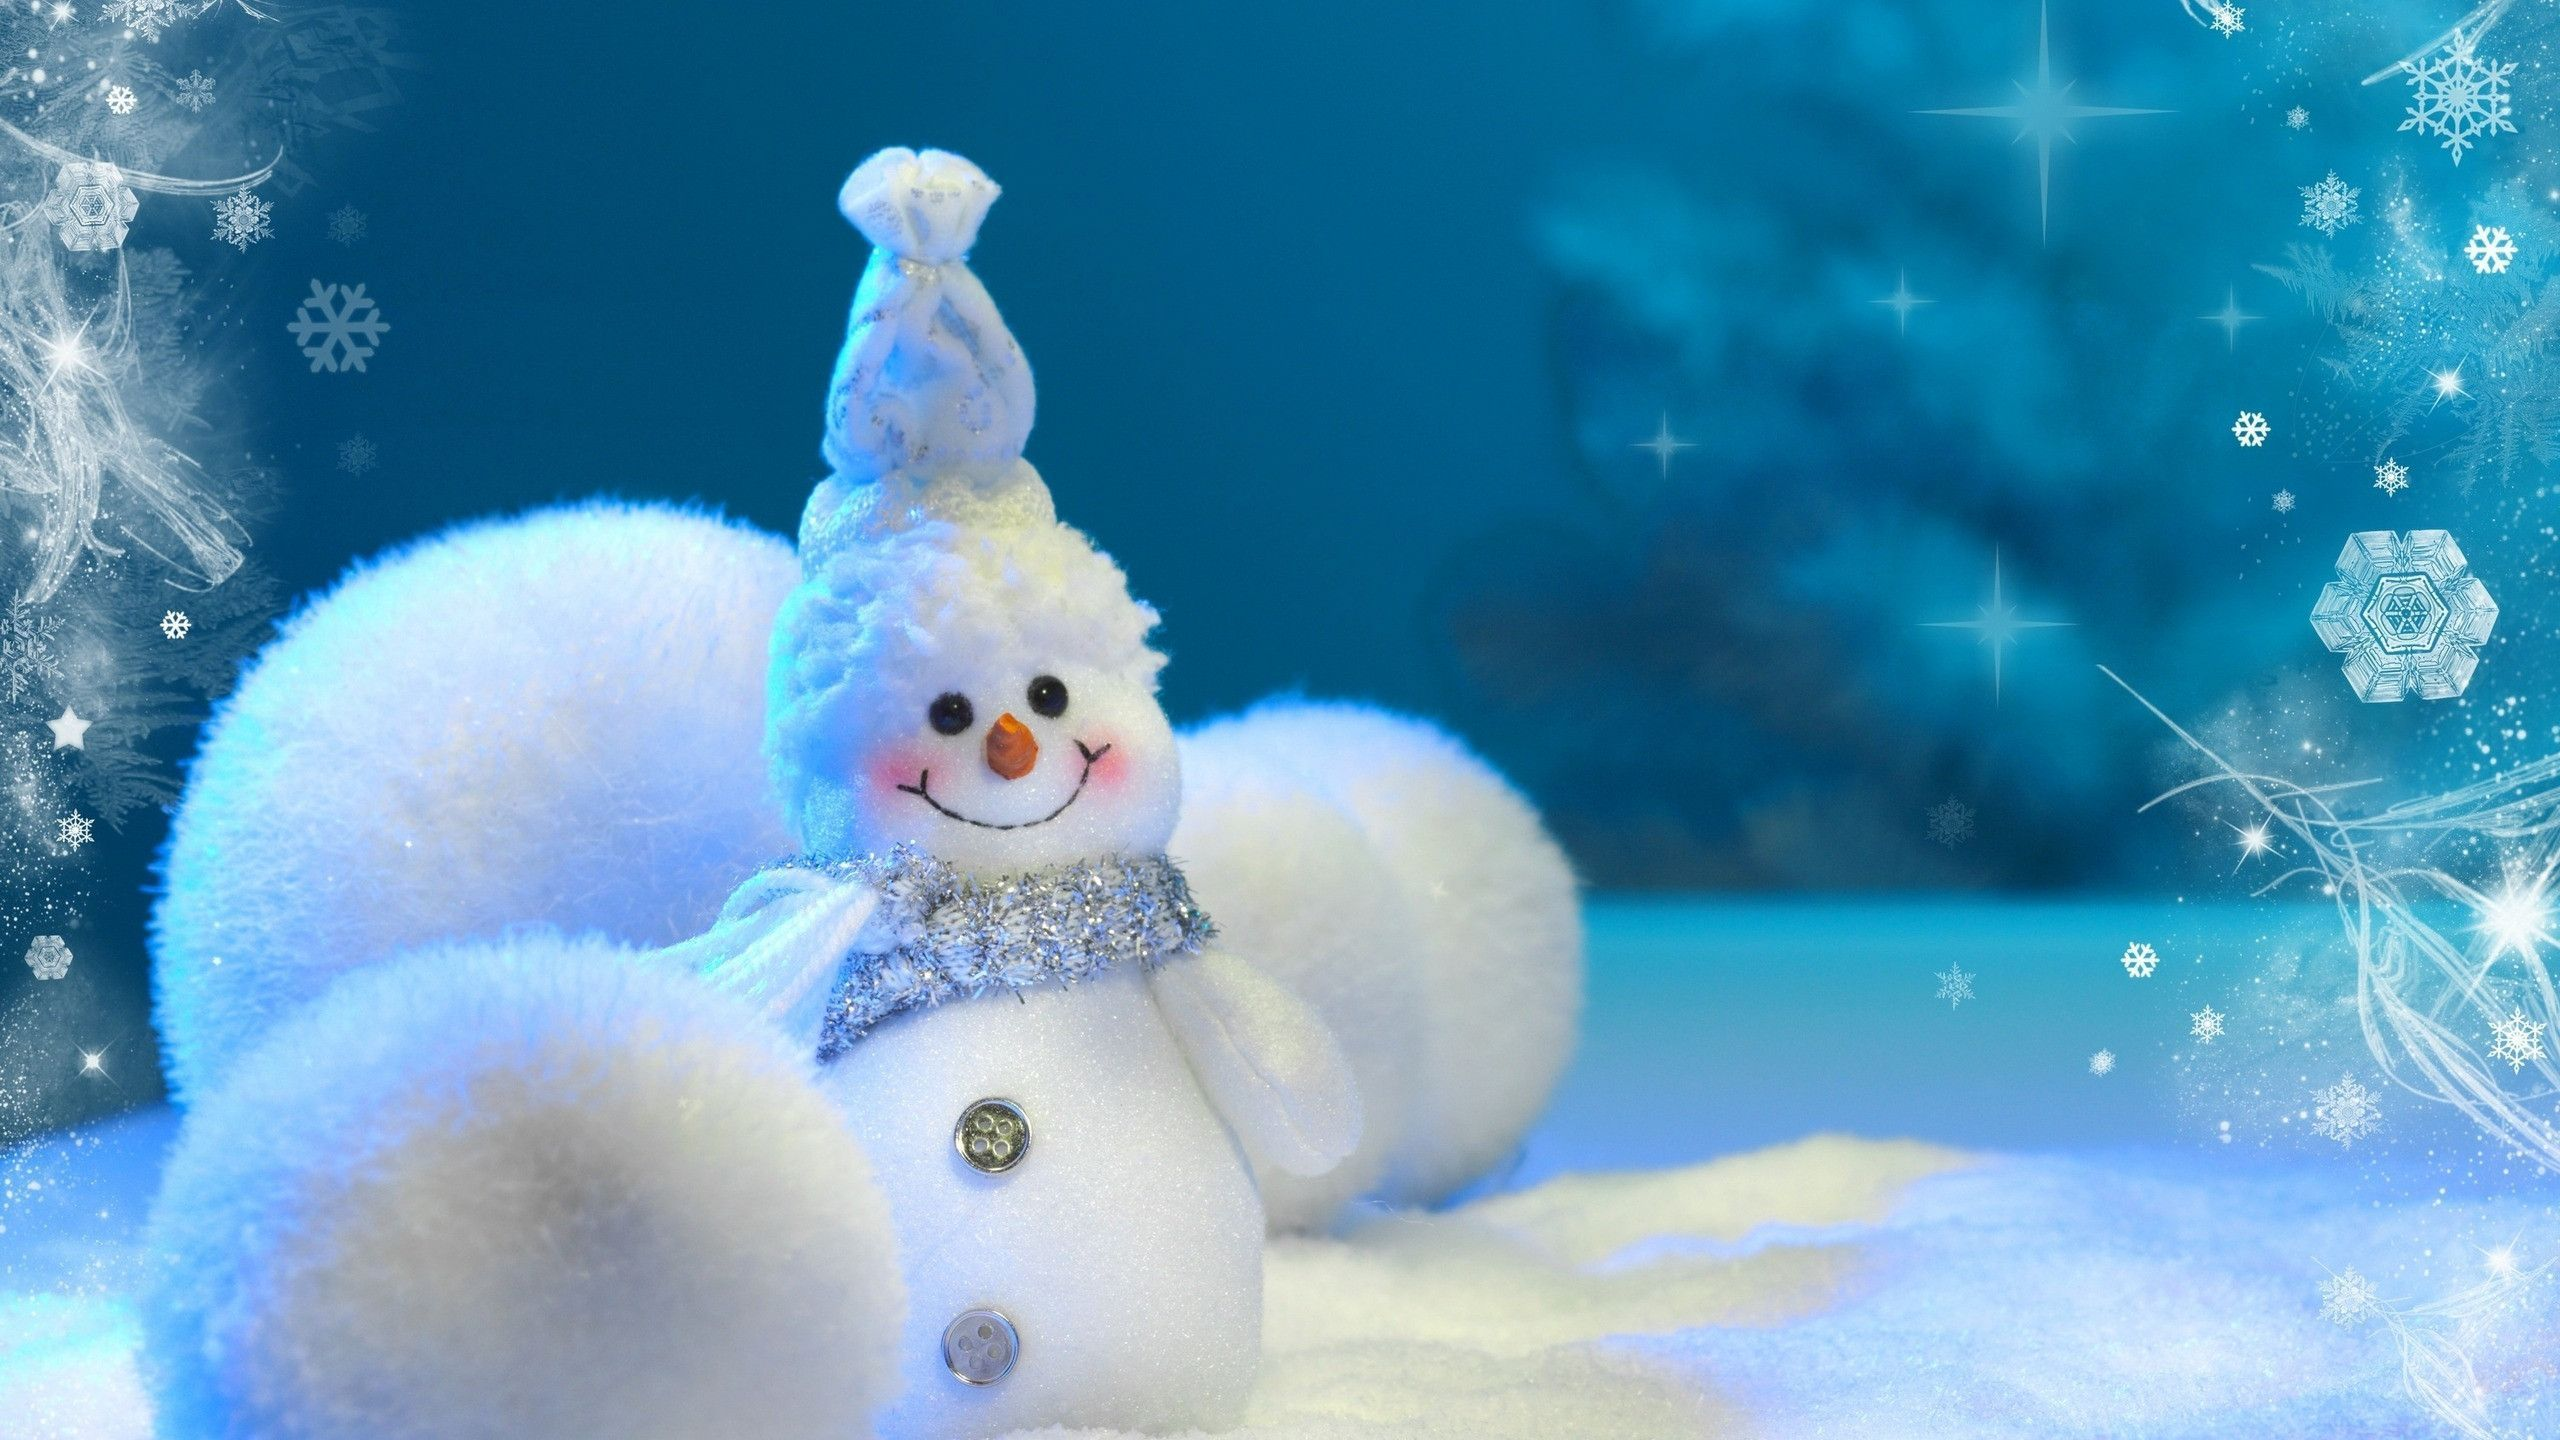 beautiful natural snowman image